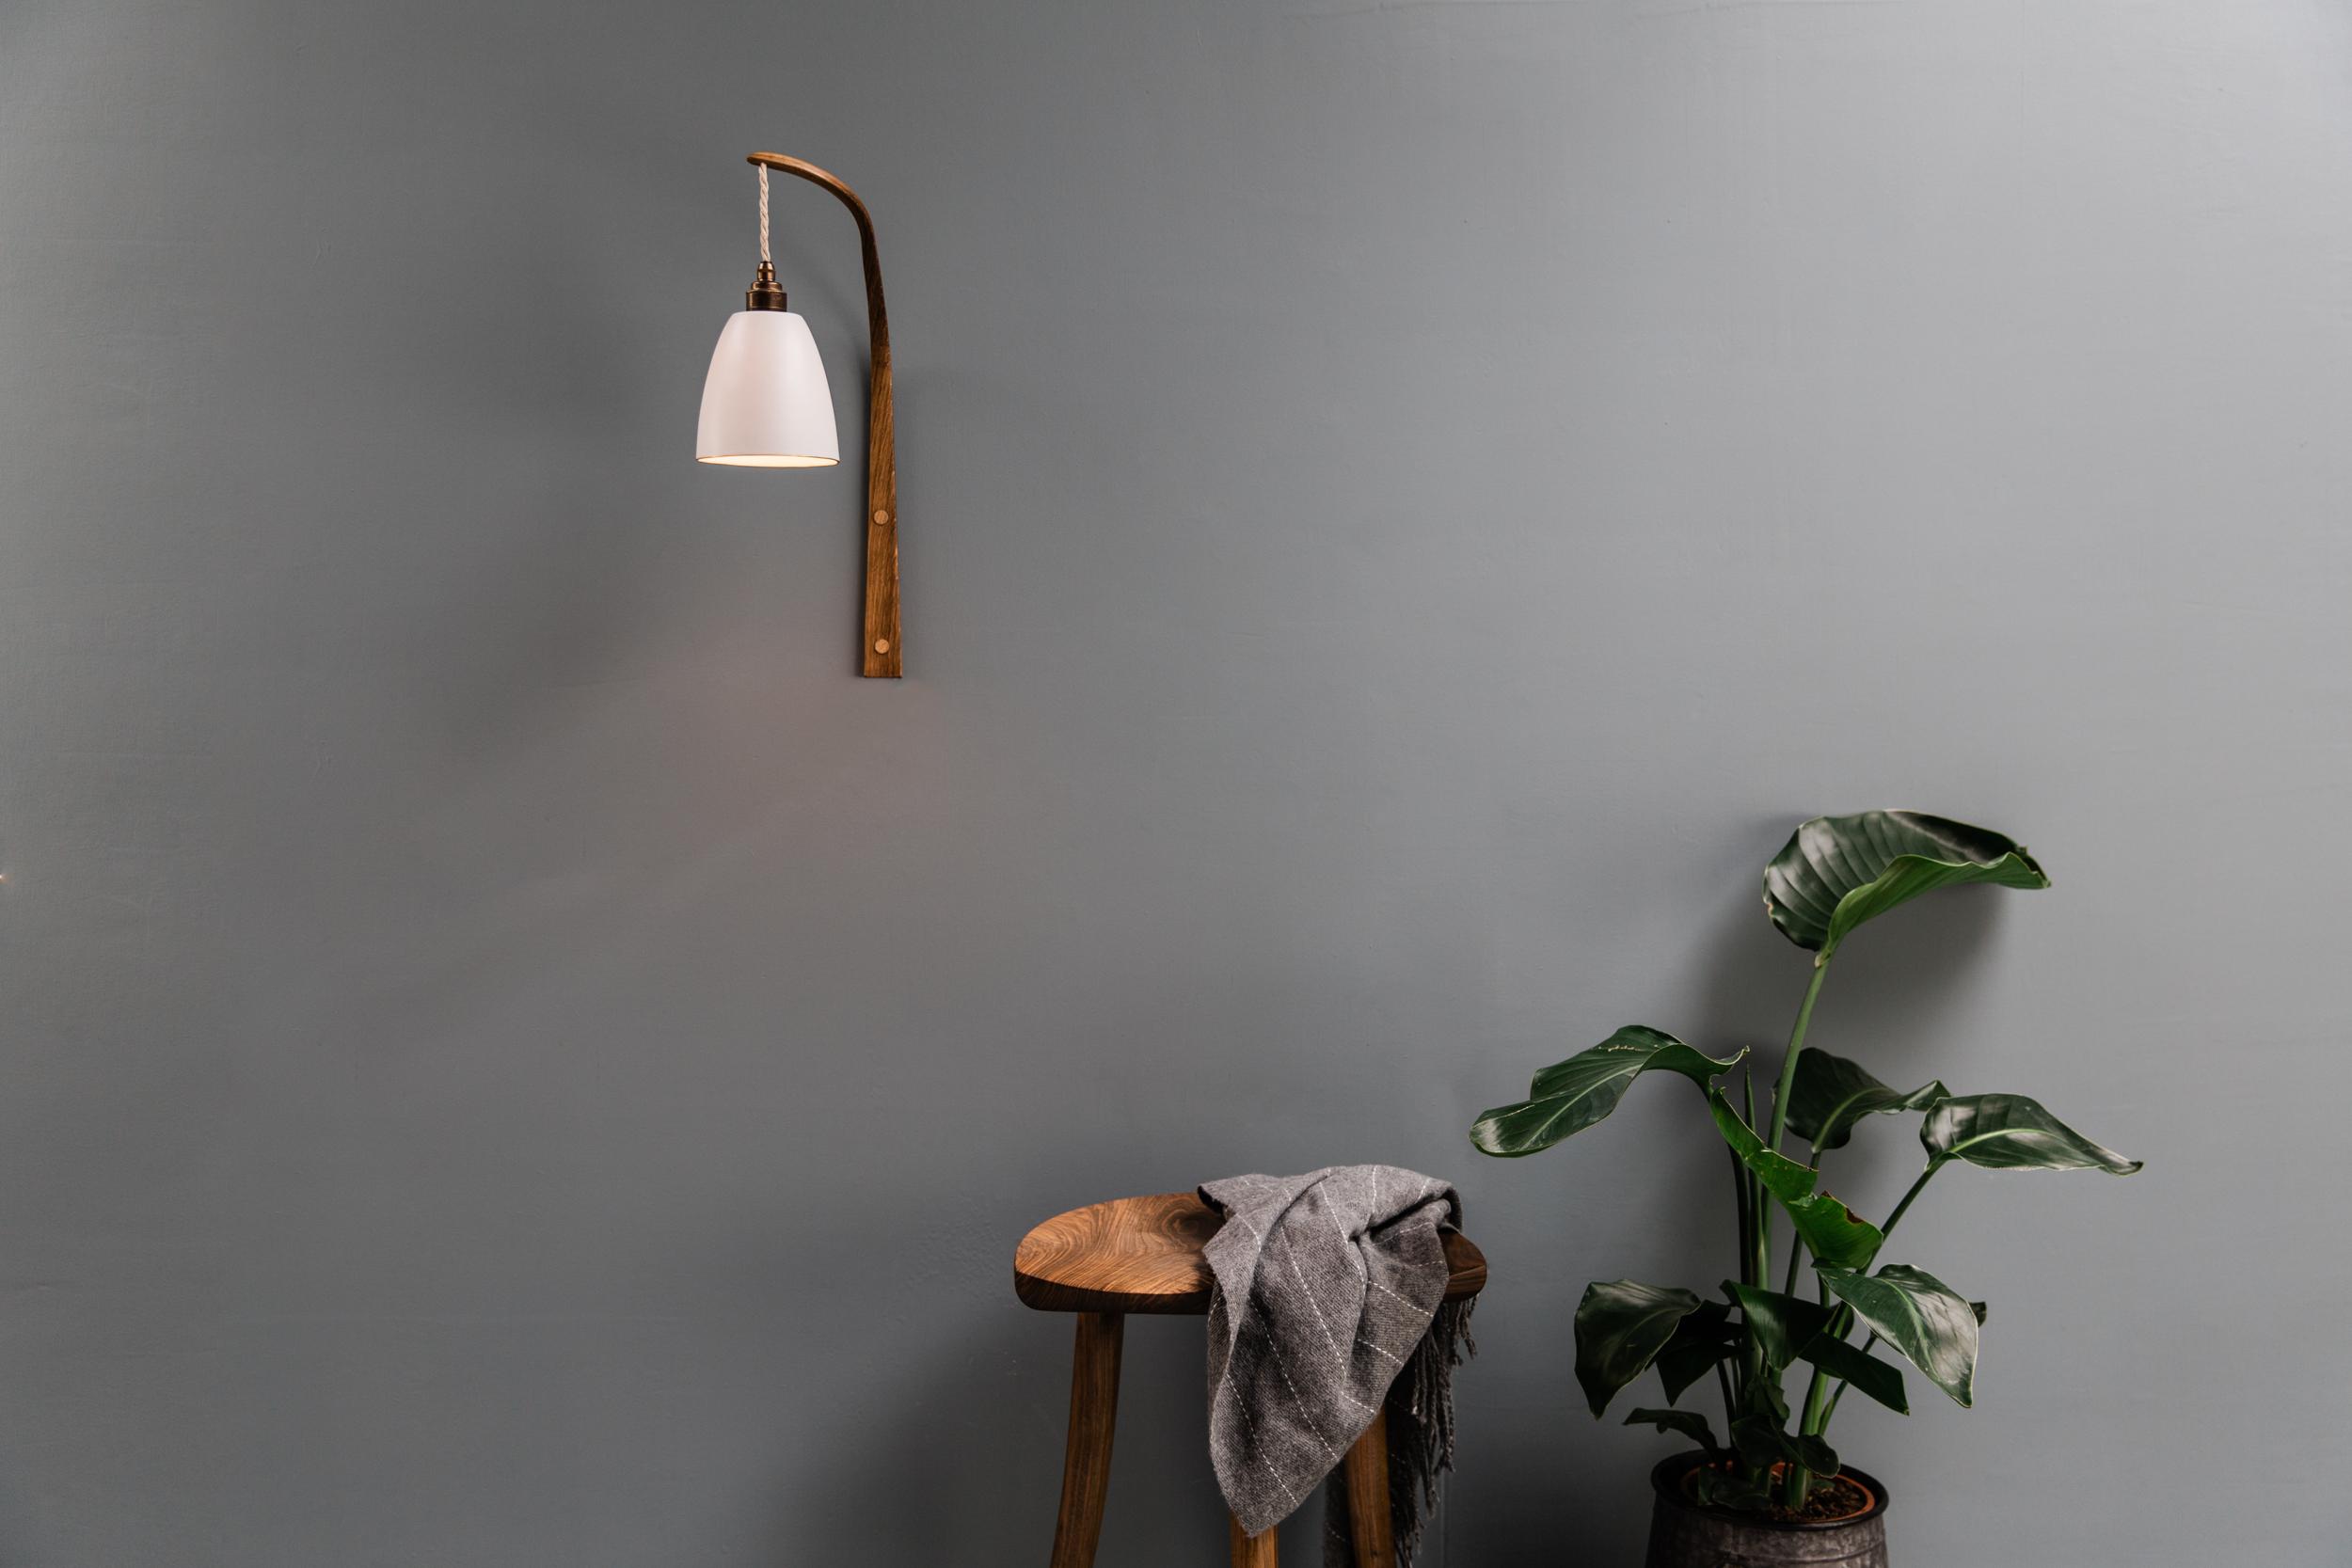 small wall light-1-1WEB SIZE.jpg